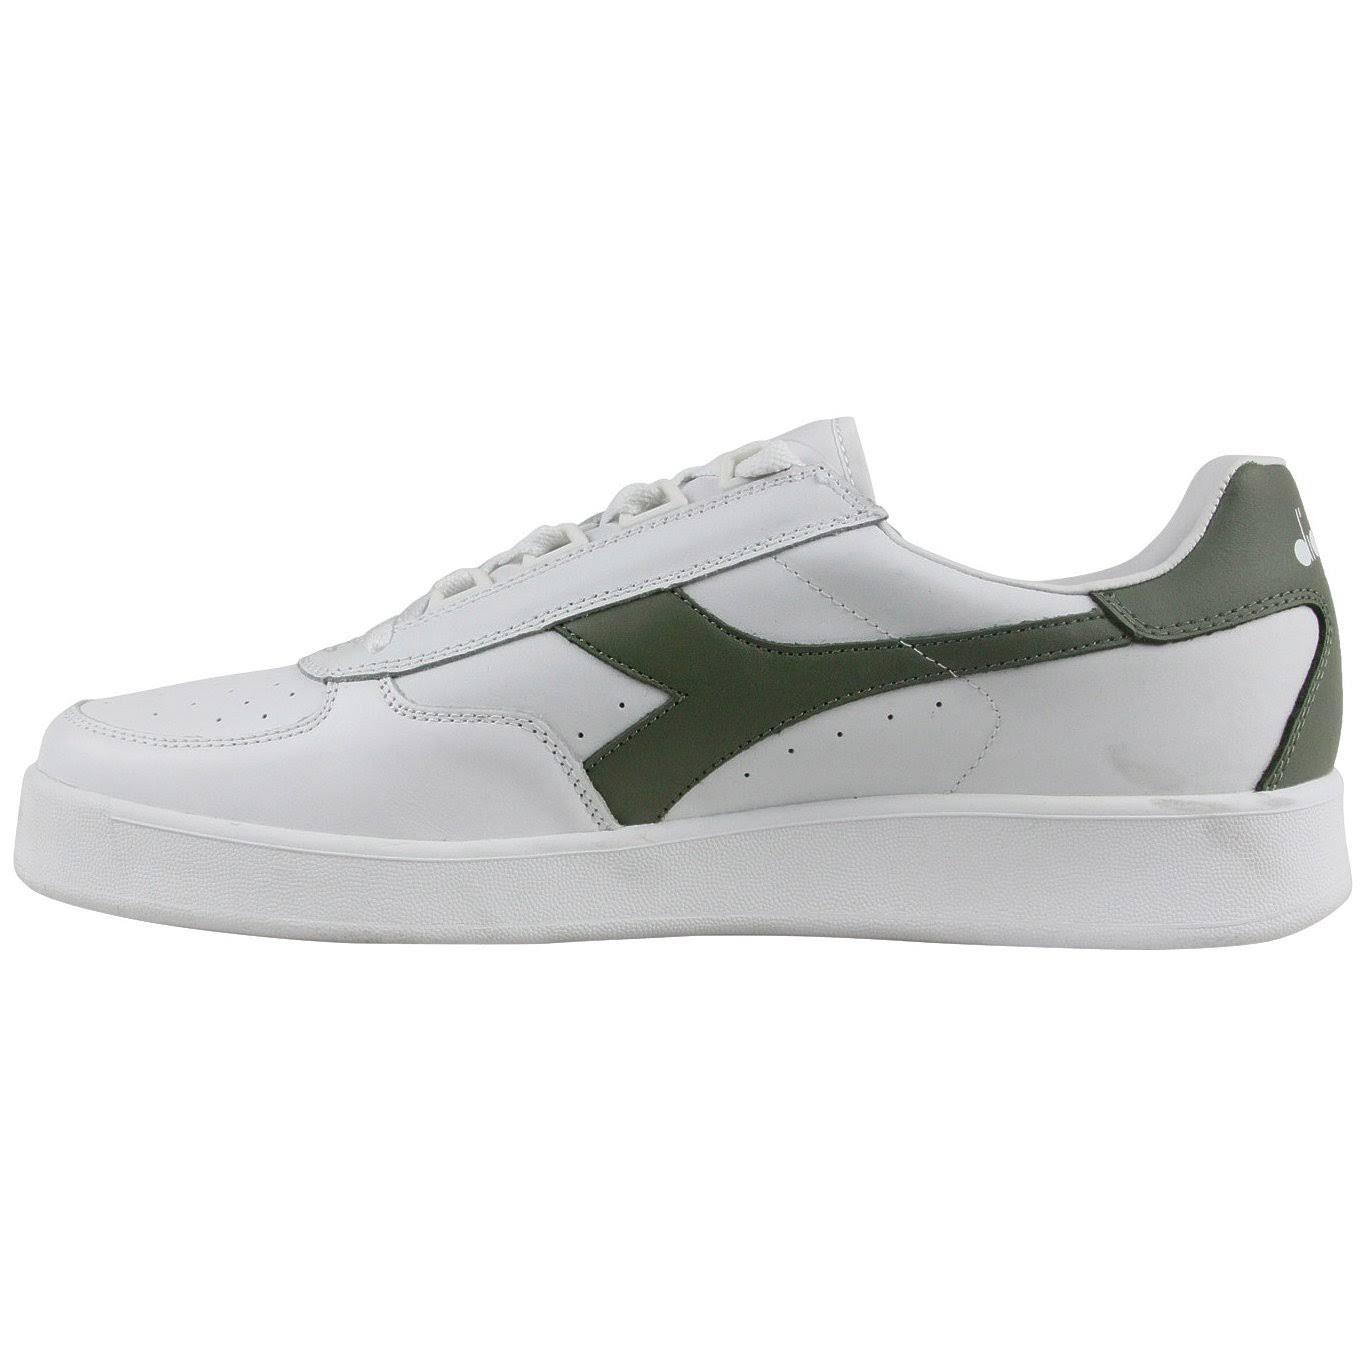 Elite Olivine Sneakers da stringate Diadora bianco Verde; uomo White B F5l31uTKJc